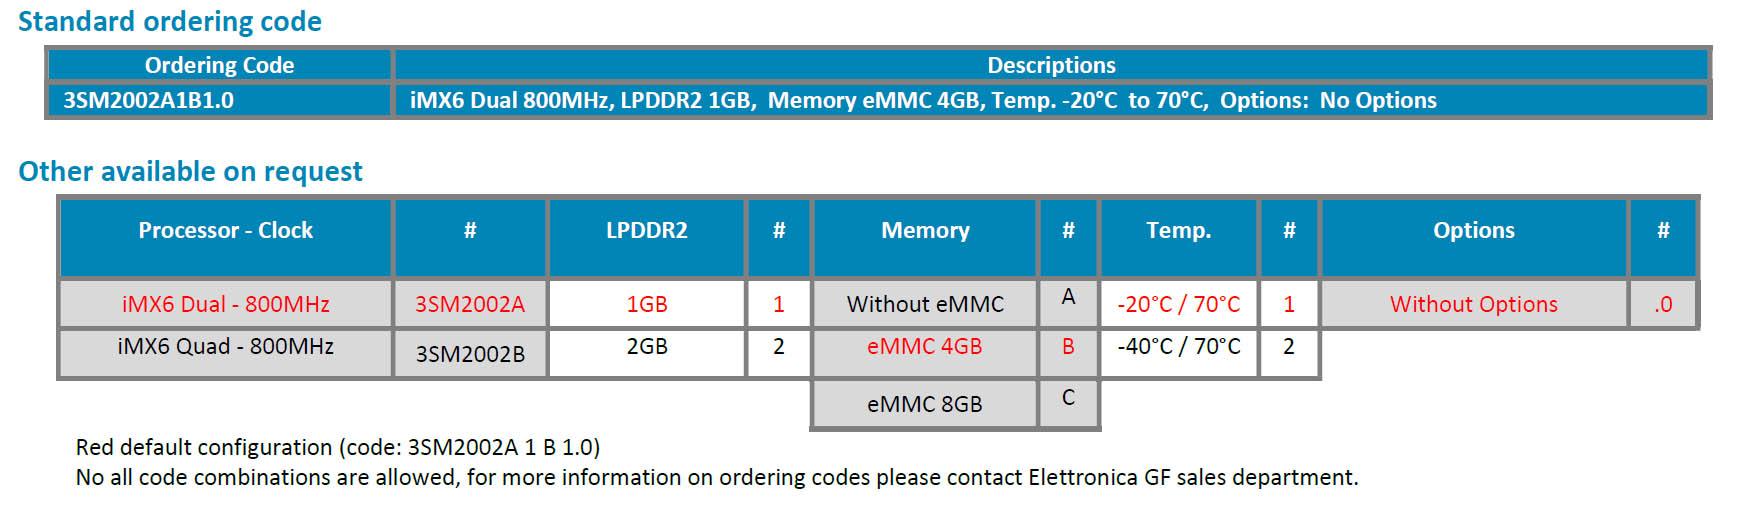 3SM2002_ordering_information